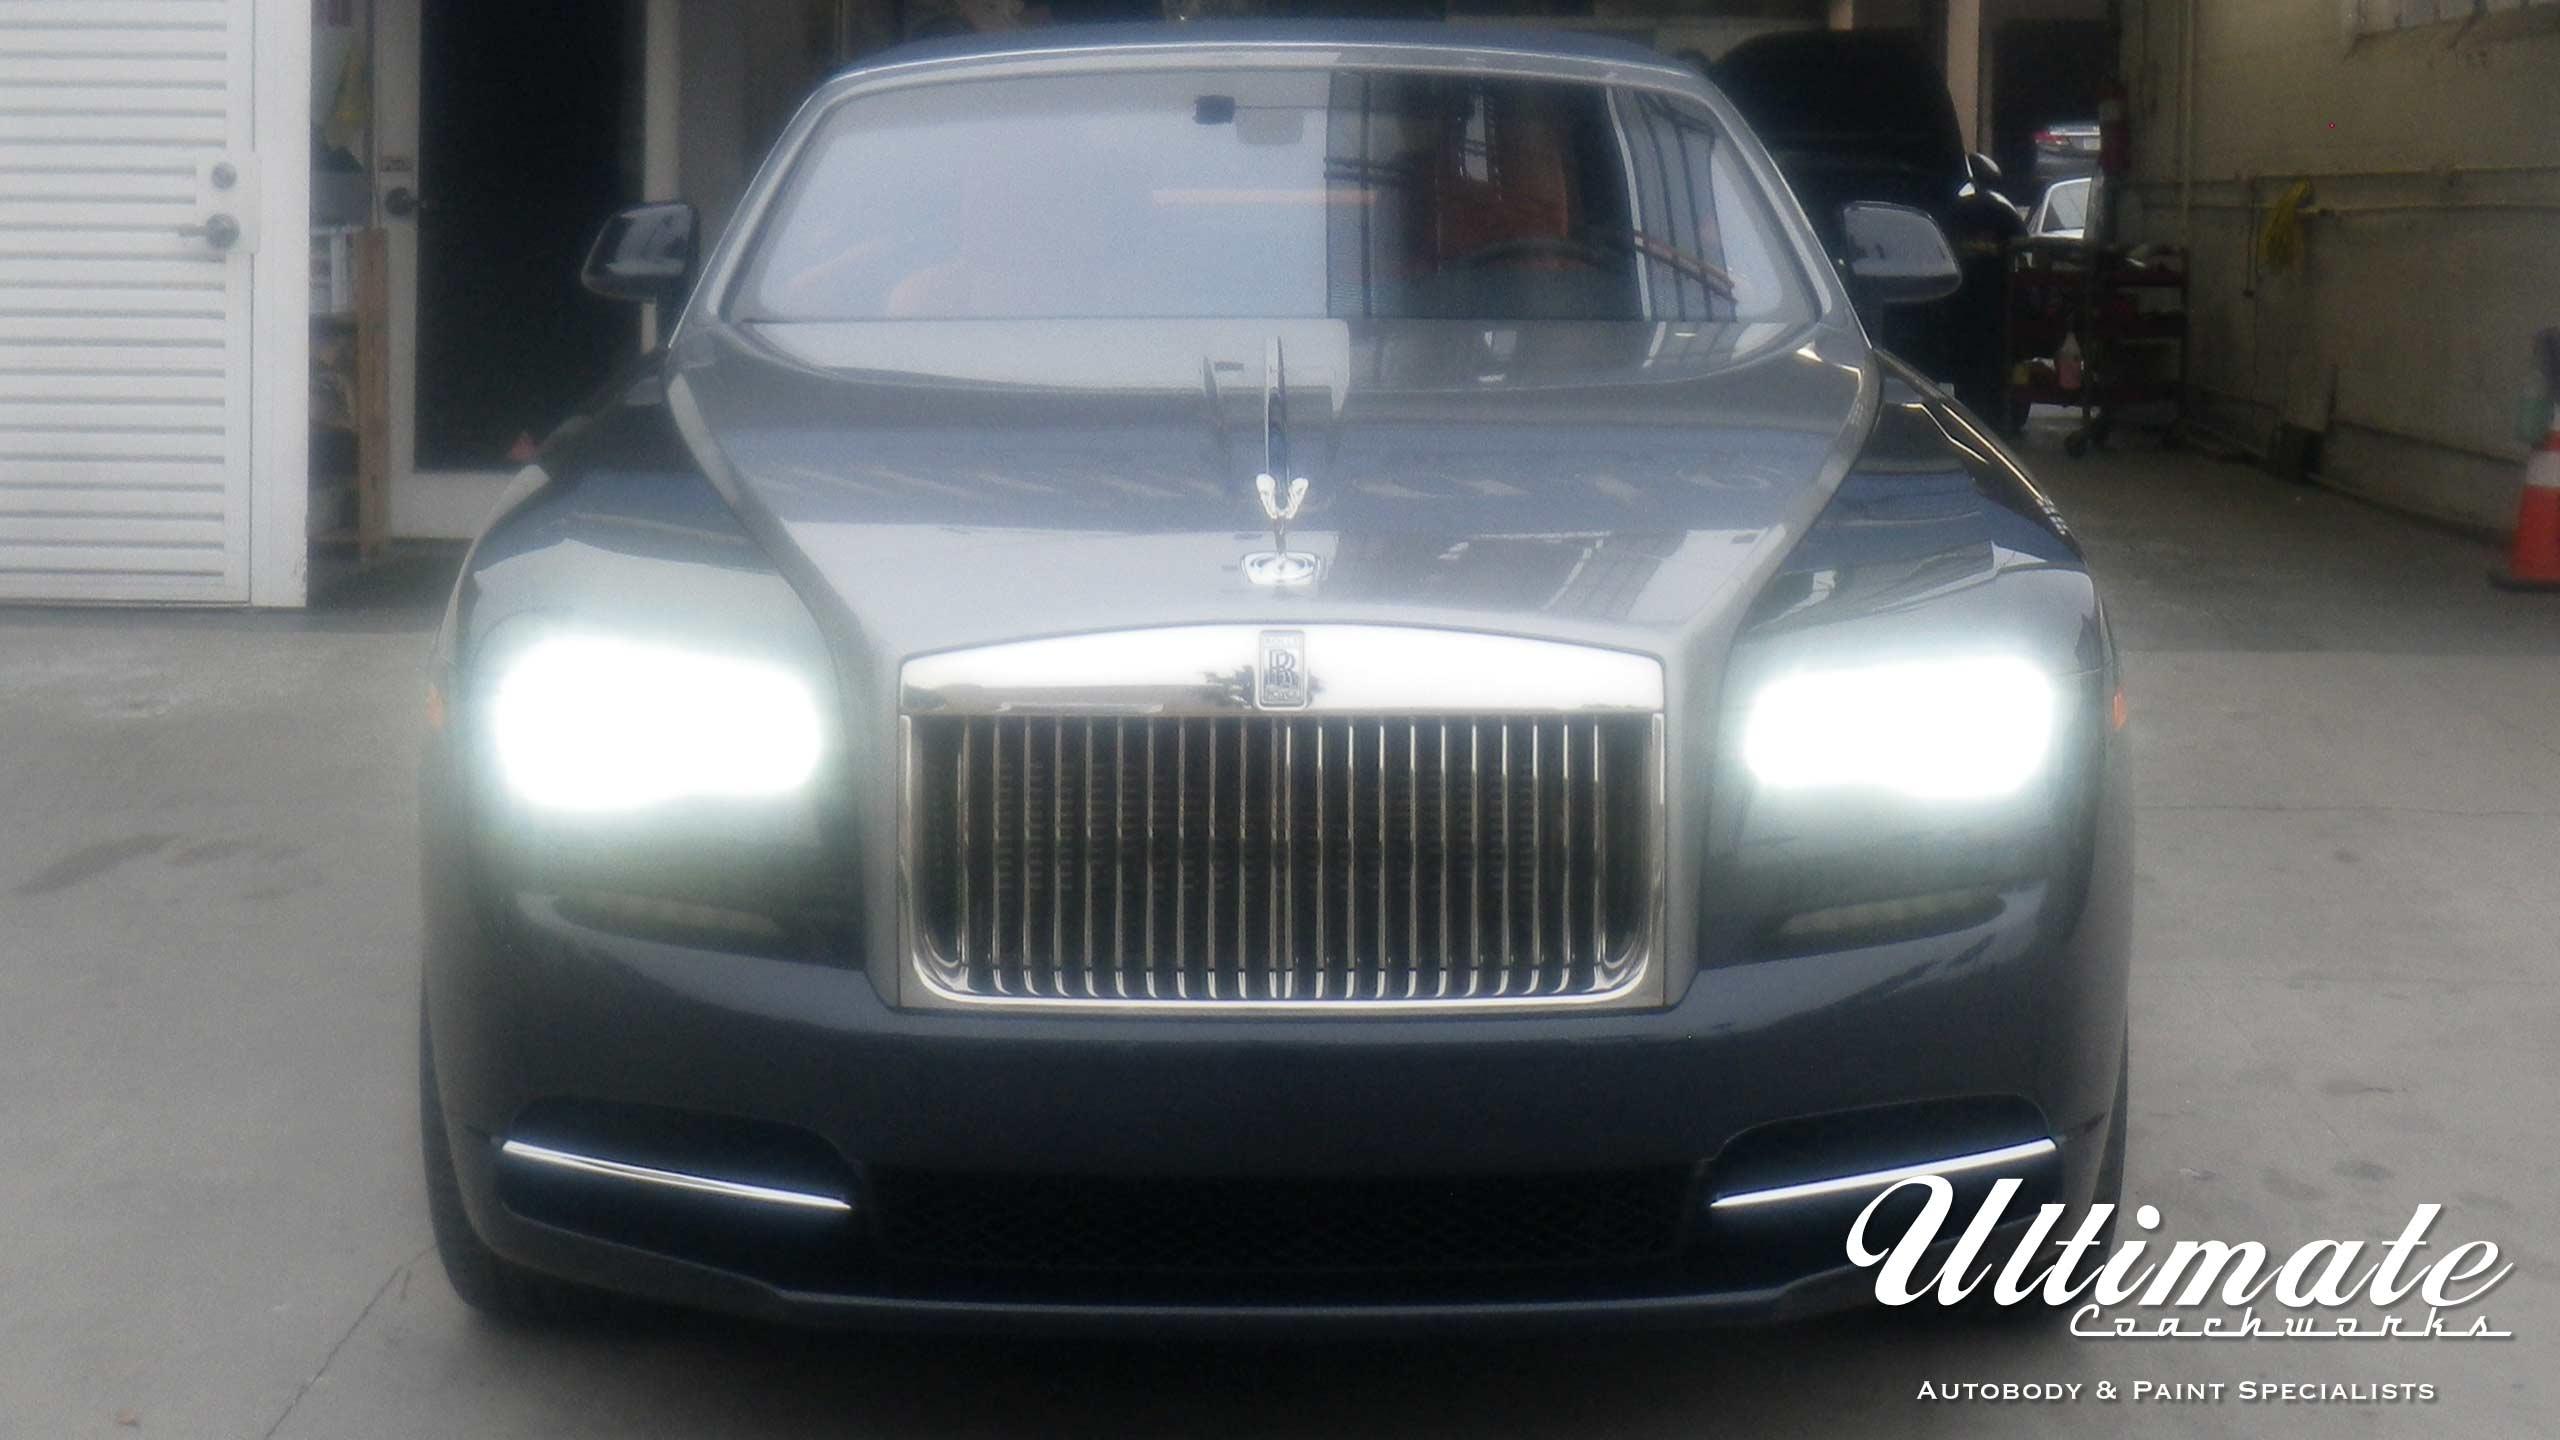 UC_BUG_1_car_front_2560x1440-003